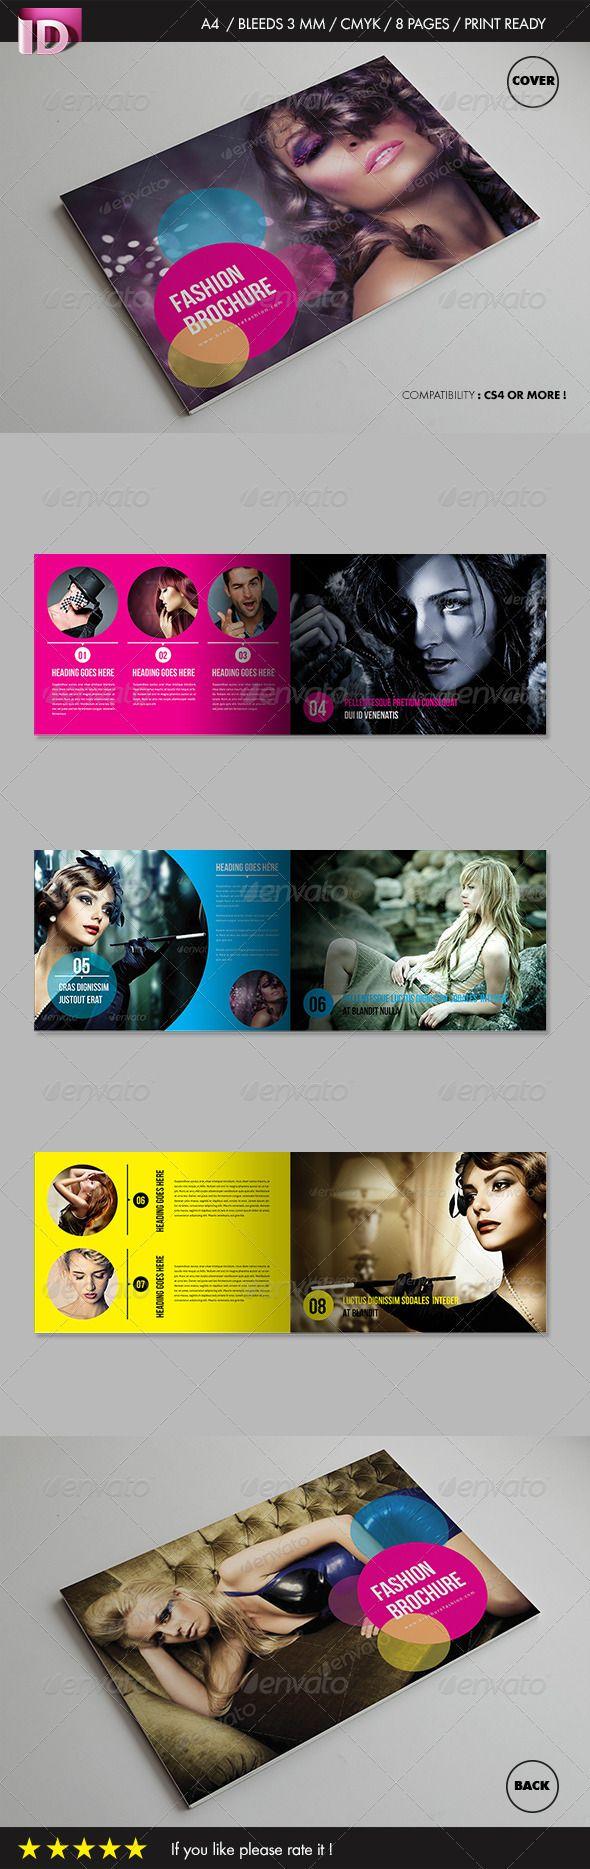 Fashion Brochure Vol 1 – Fashion Design Brochure Template